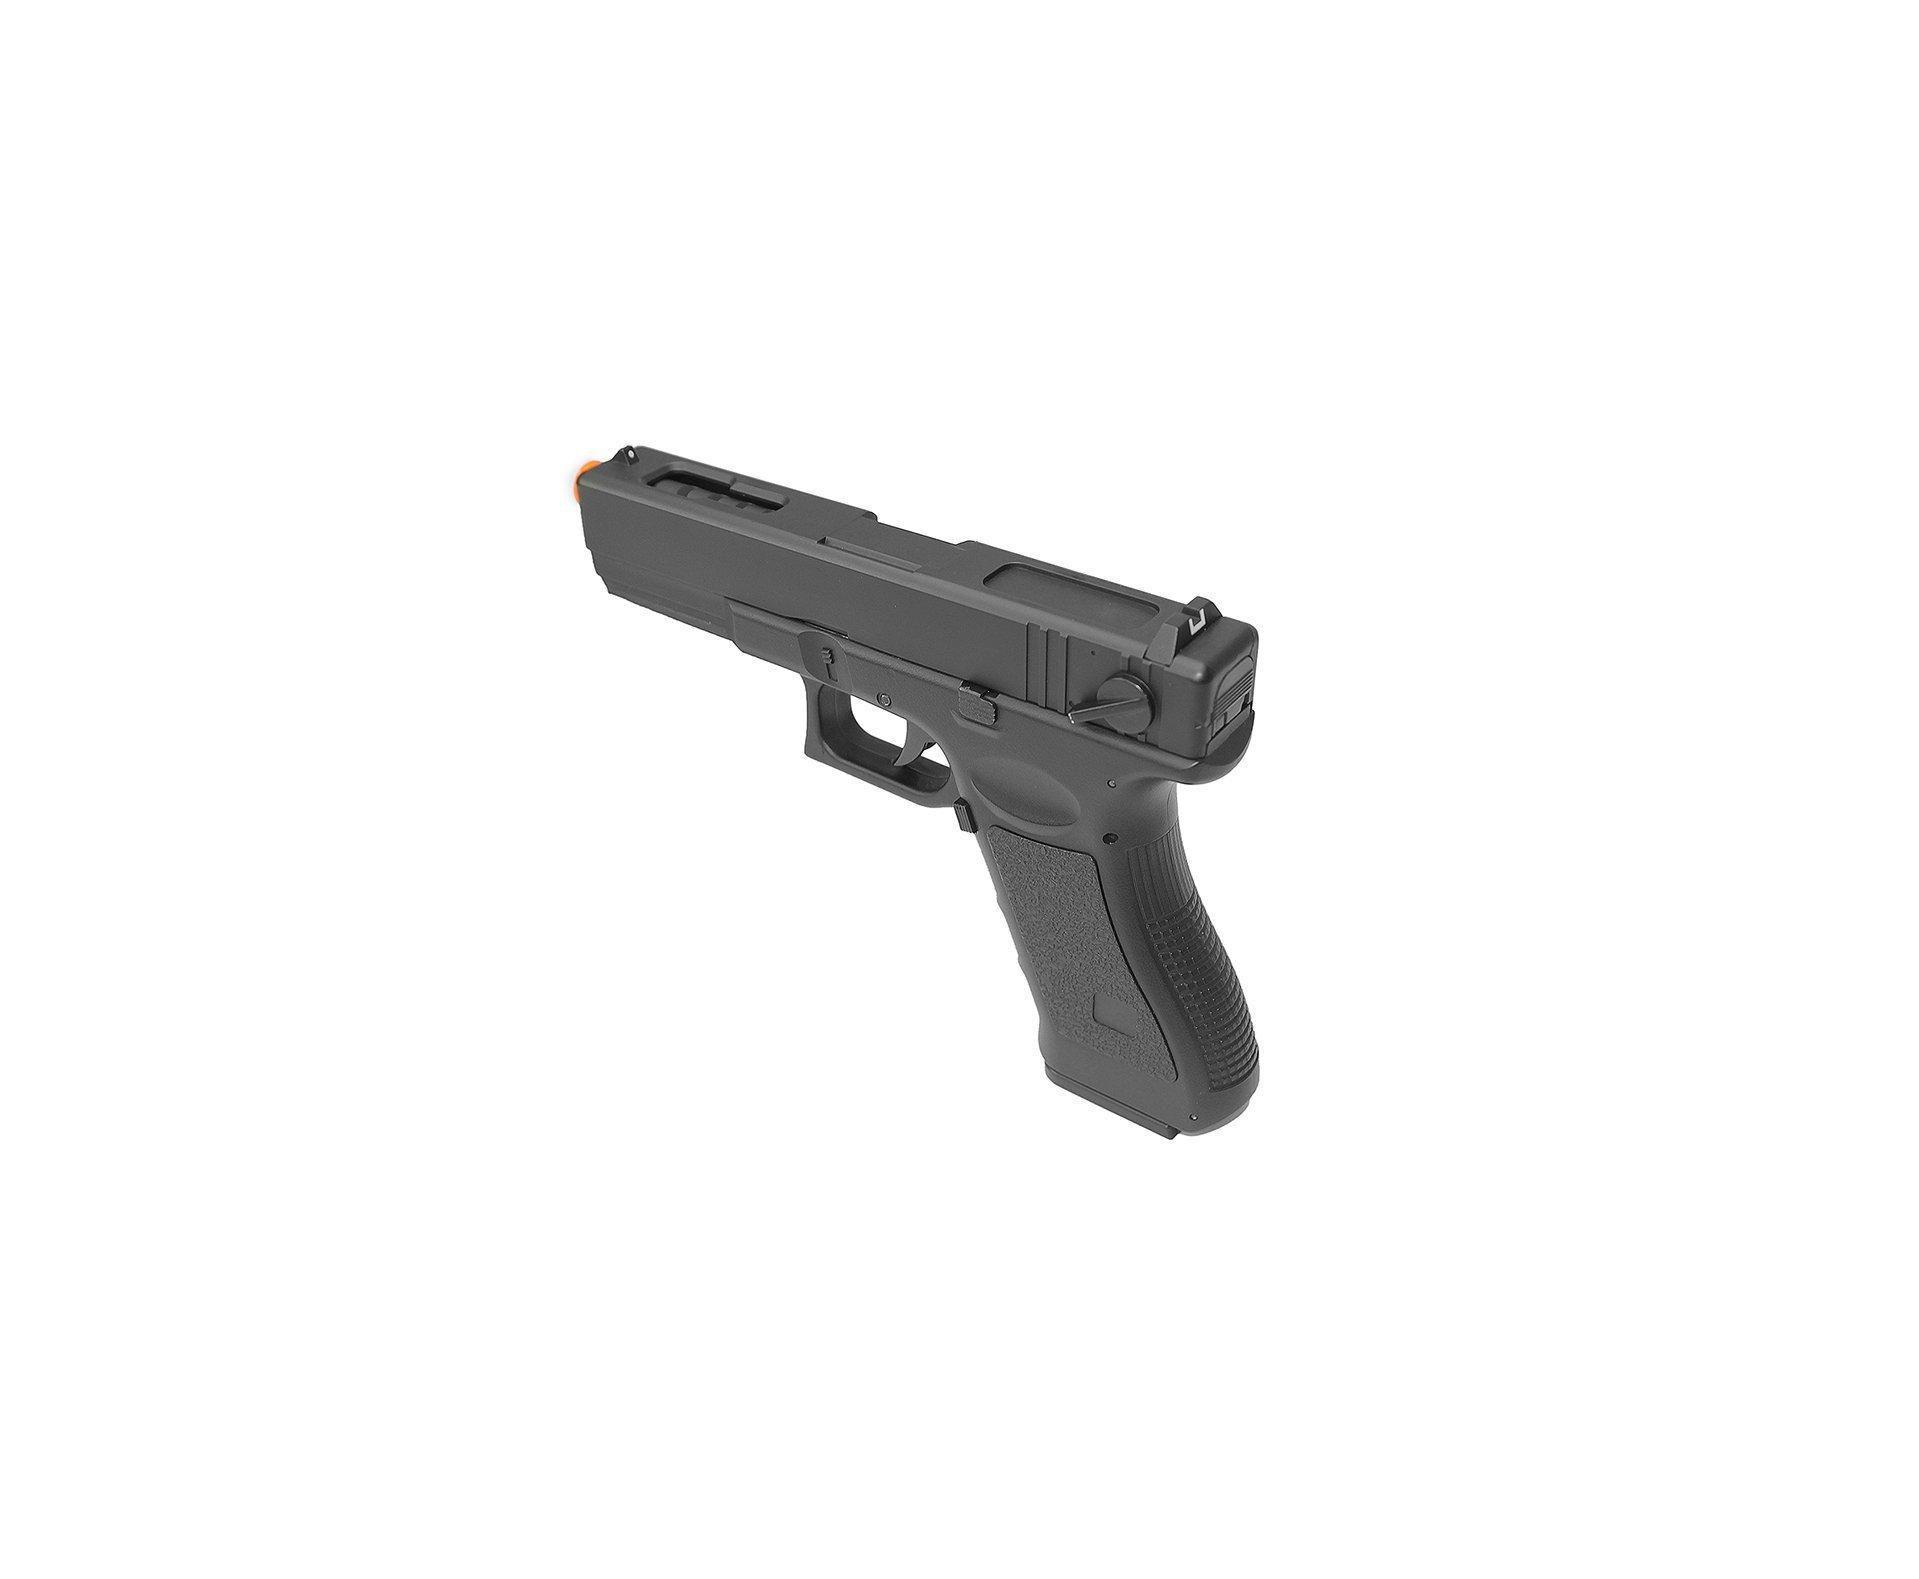 Pistola De Airsoft Eletrica Glock G18c - Calibre 6,0 Mm - Cyma